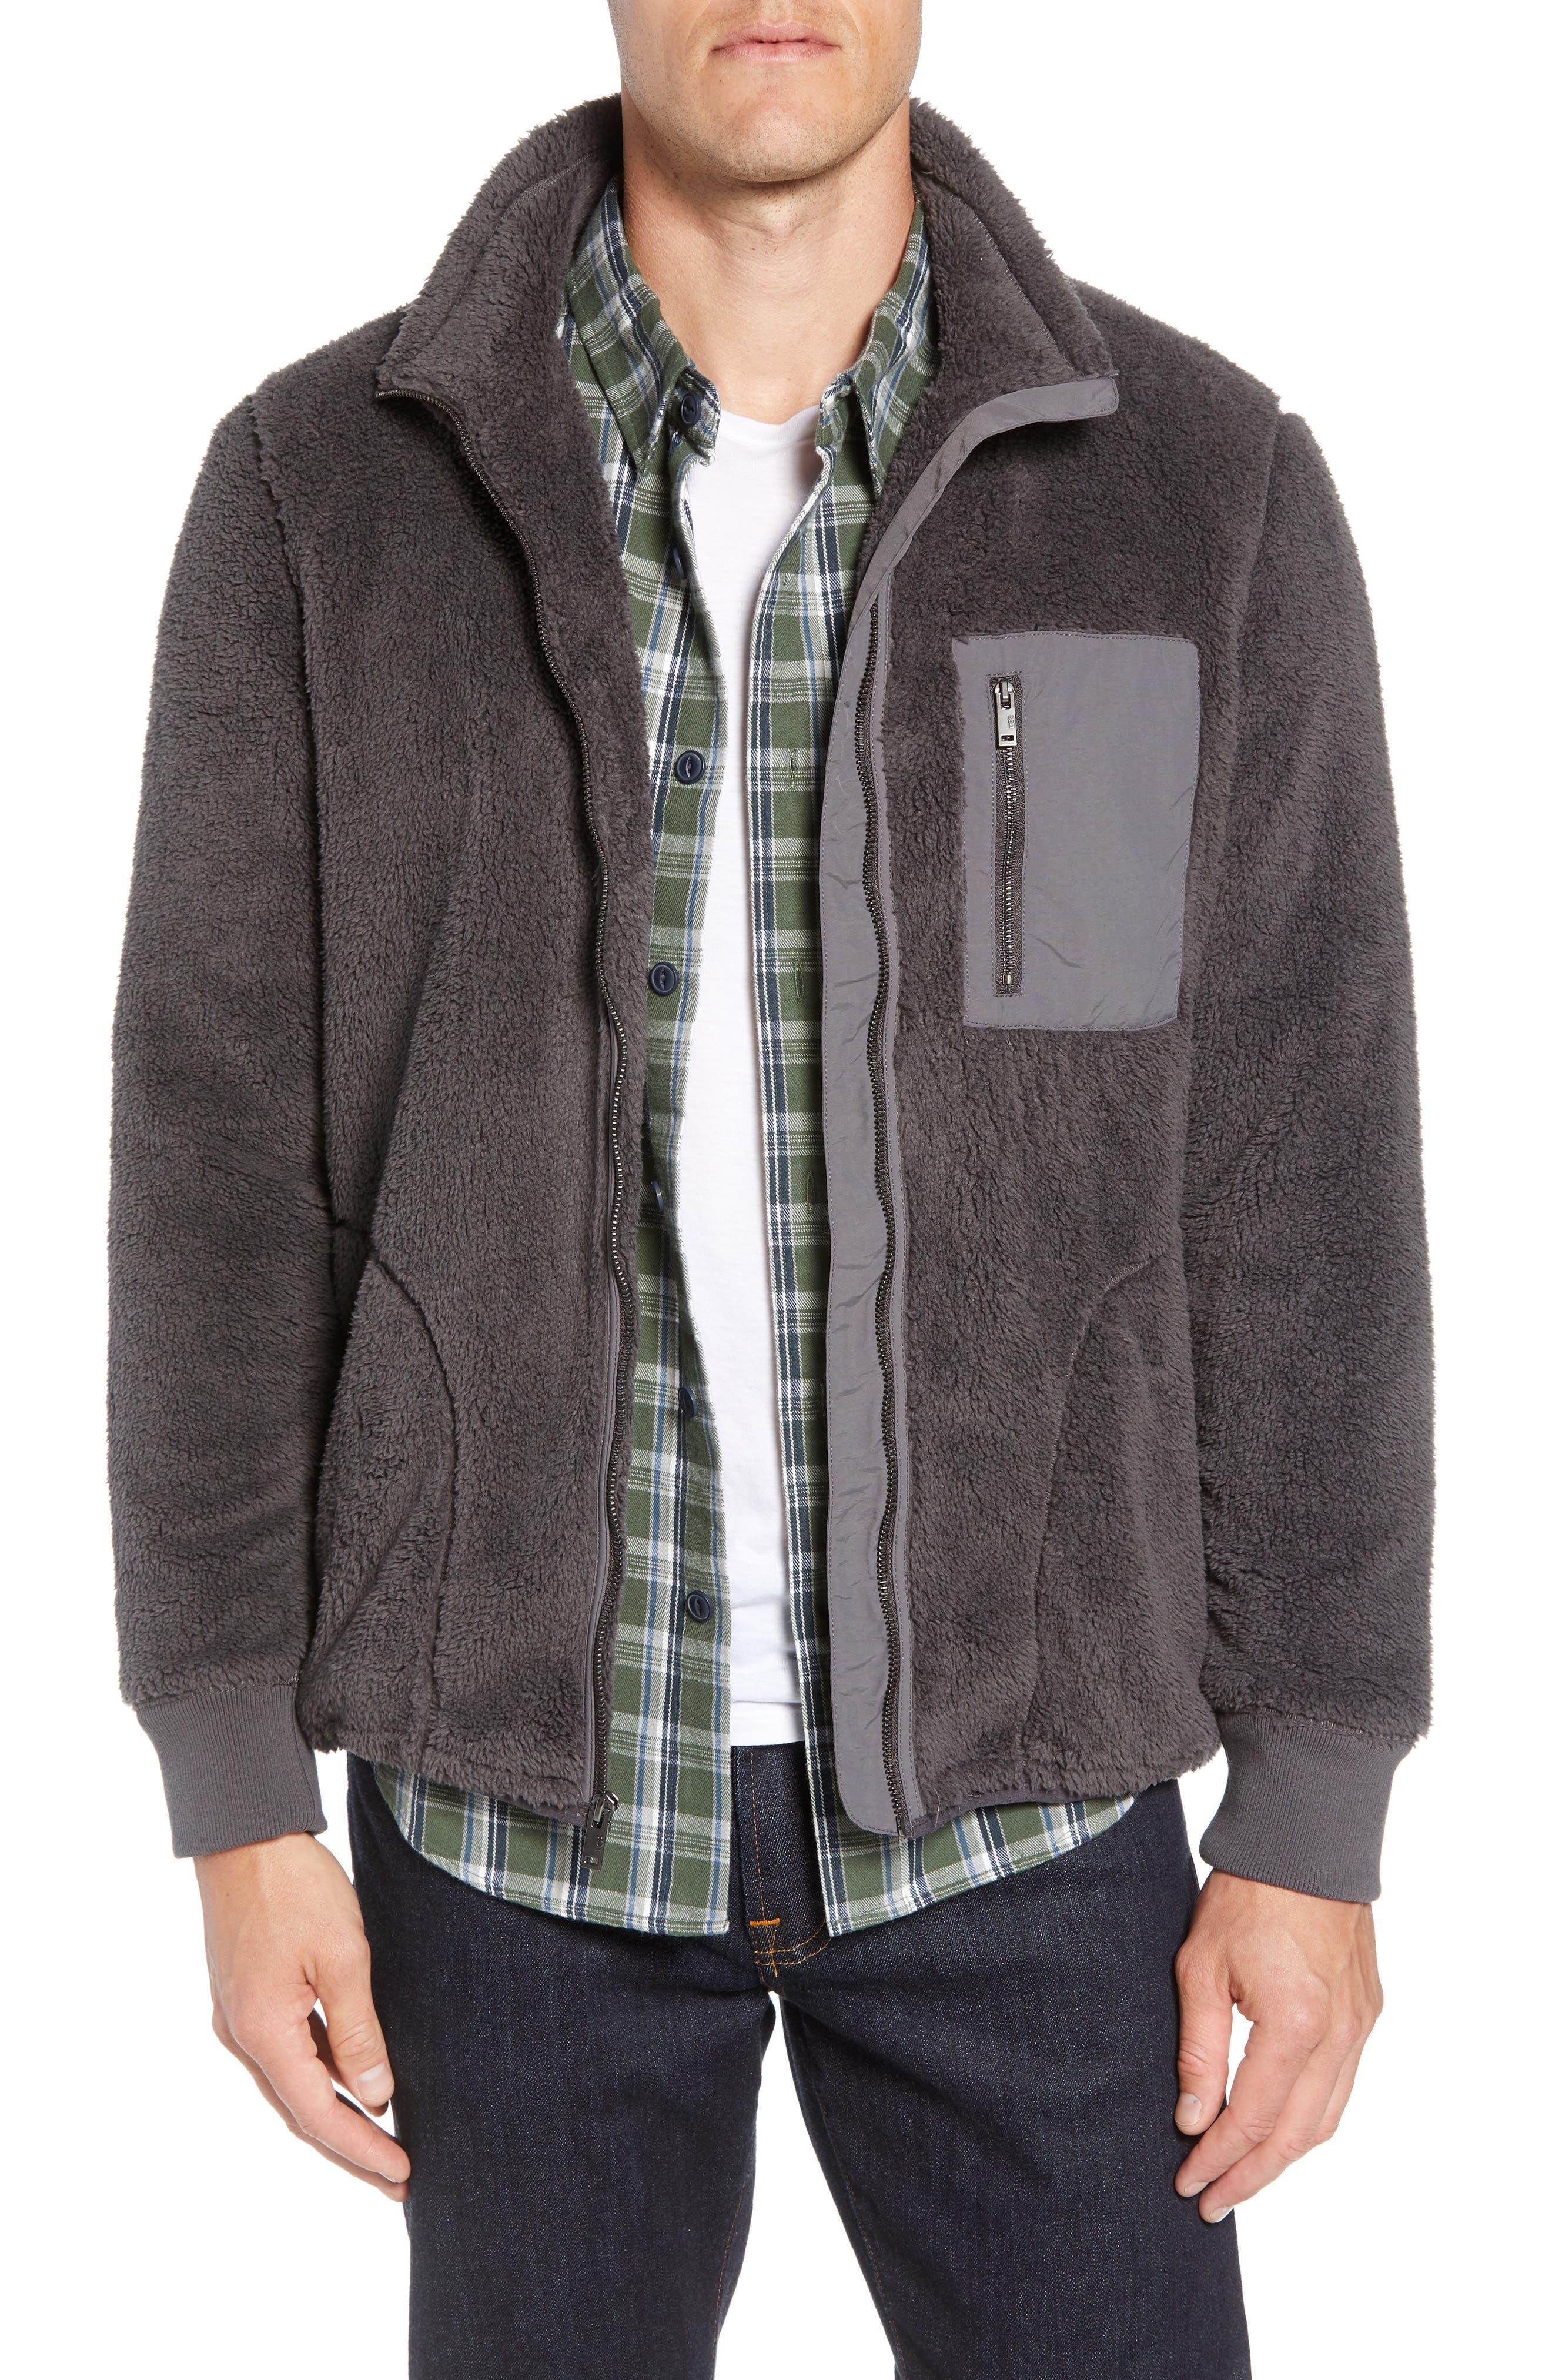 UGG<SUP>®</SUP>, Lucas High Pile Fleece Sweater Jacket, Main thumbnail 1, color, CHARCOAL